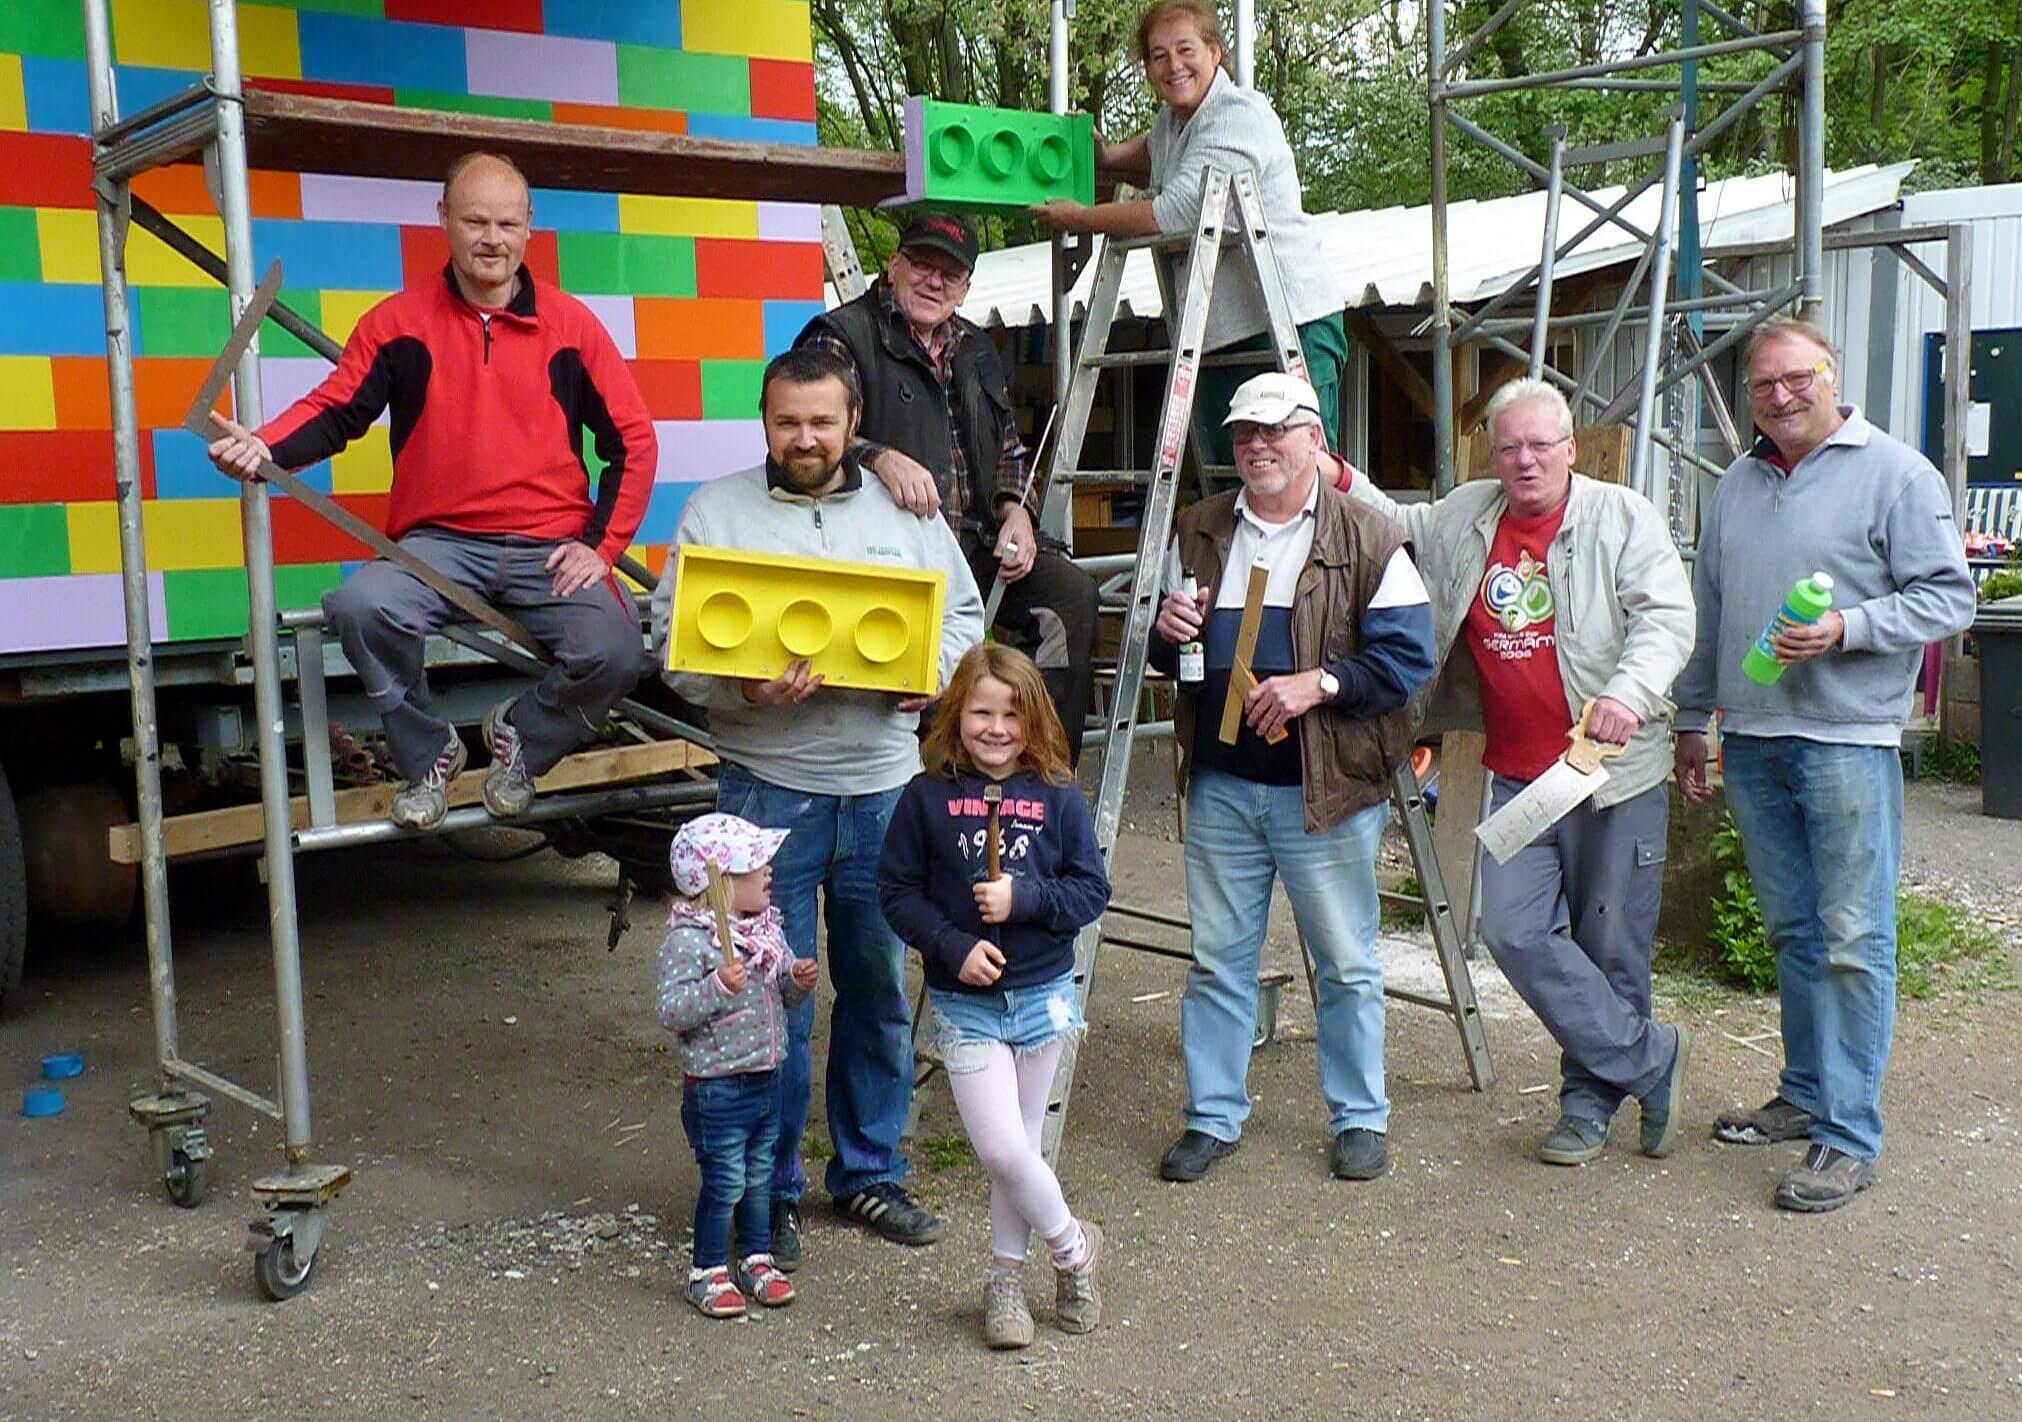 Kirmesgruppe Mühlenhämmer baut Brücken aus LEGO